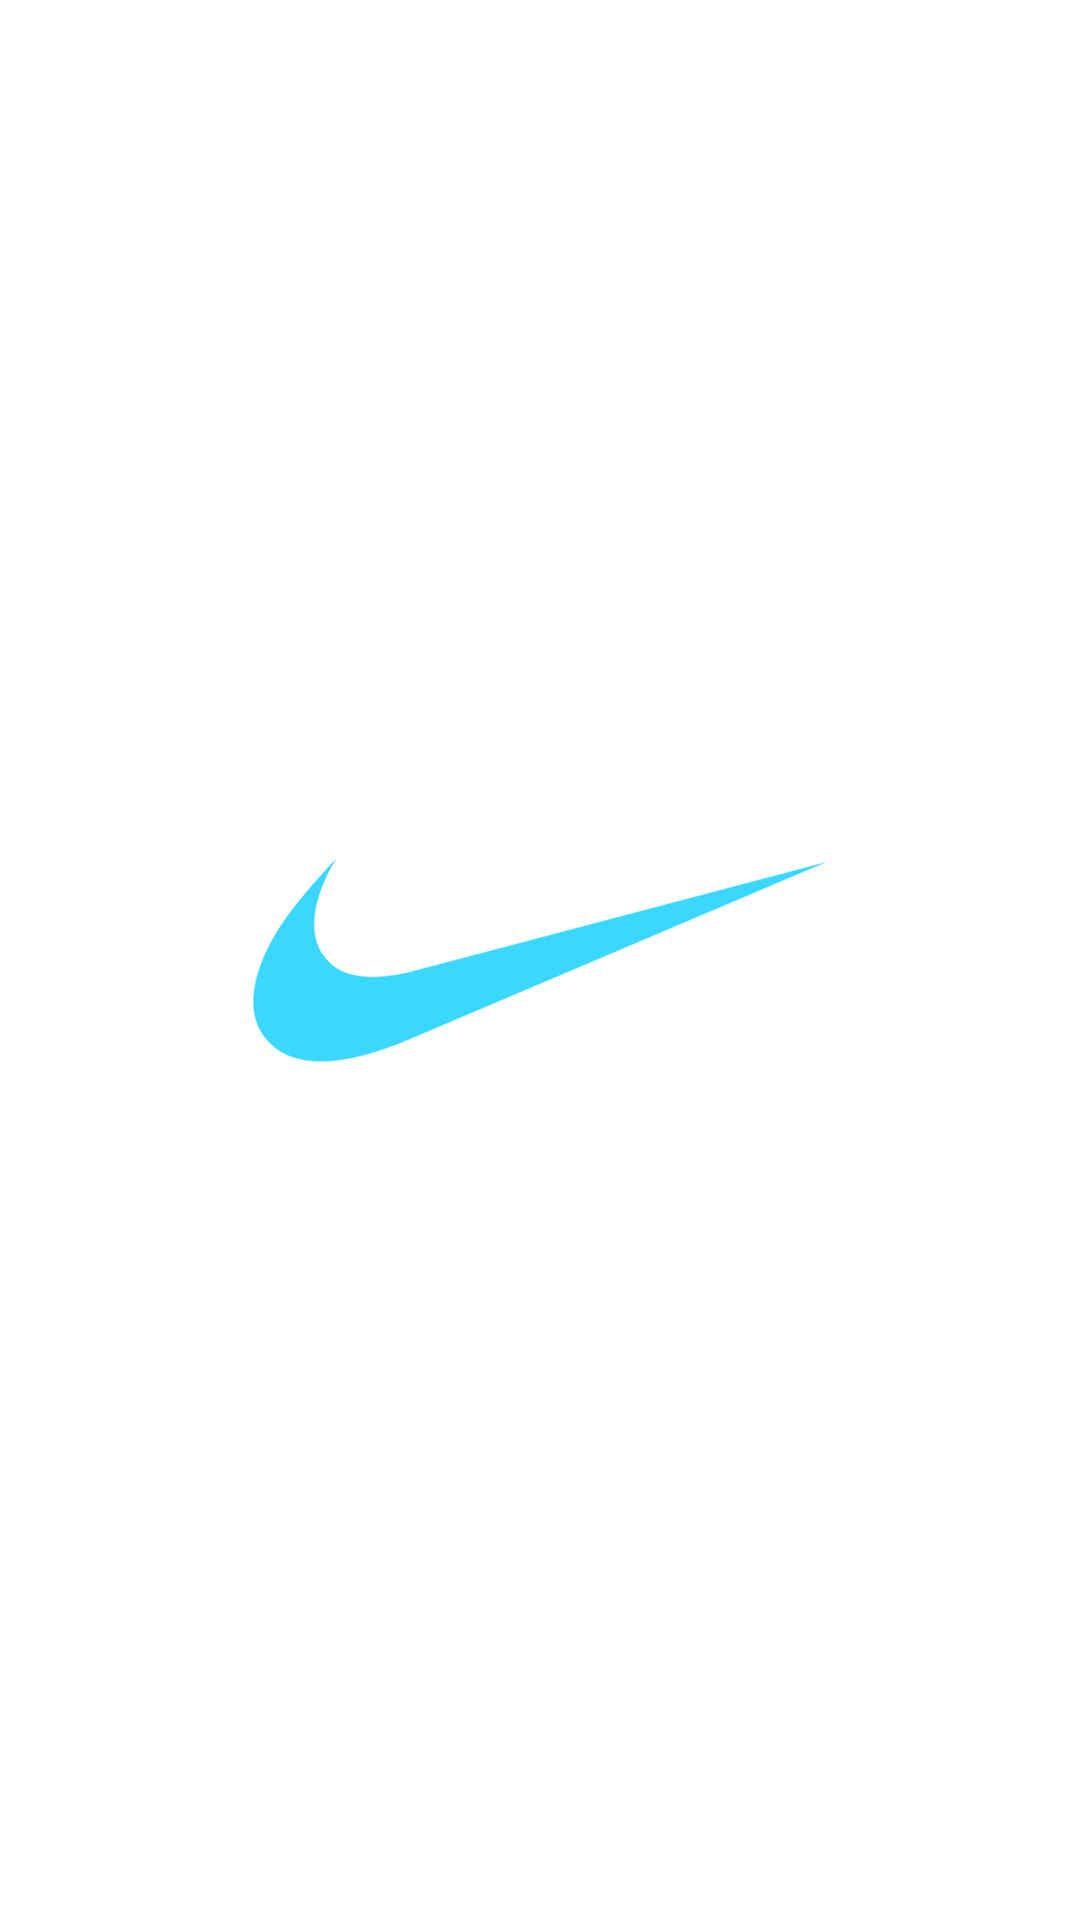 Nike Logo Iphone Wallpaper Papel De Parede Da Nike Papel De Parede Estrelas Papeis De Parede Para Iphone